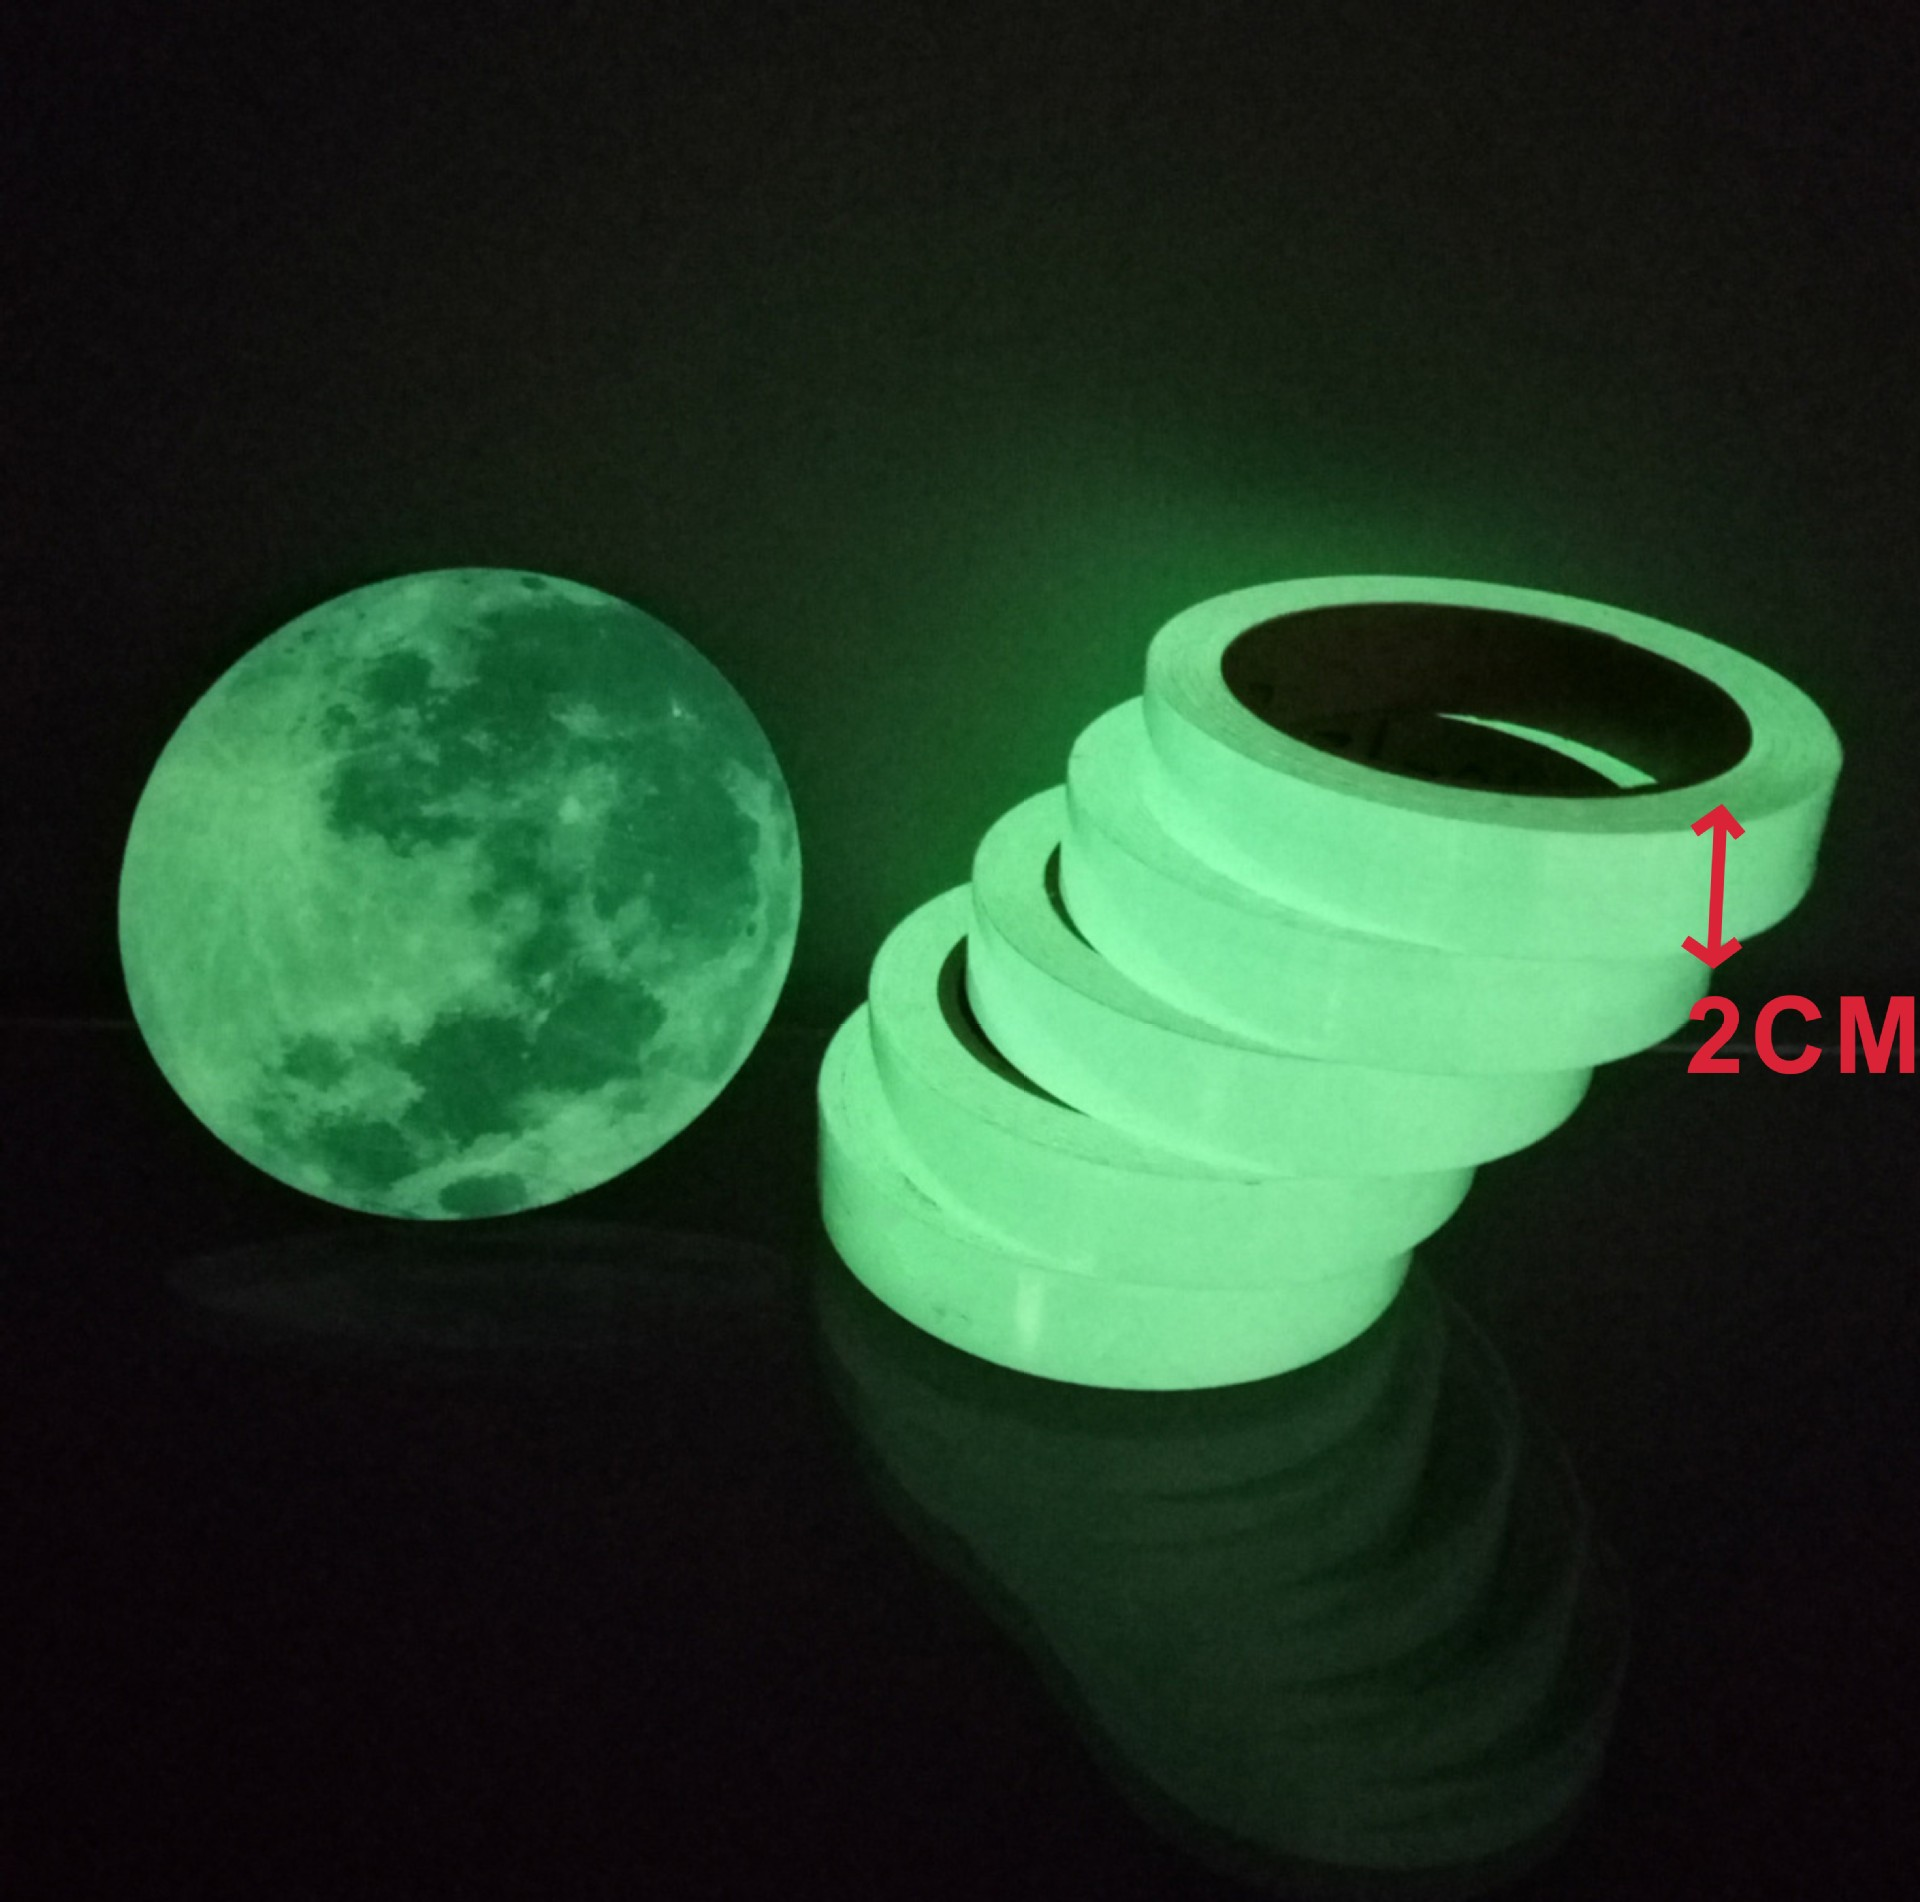 Luminous Tape Self Adhesive PET Warning Tape Night Vision Glow In Dark Wall Sticker Fluorescent Emergency Stickers Glow In Dark